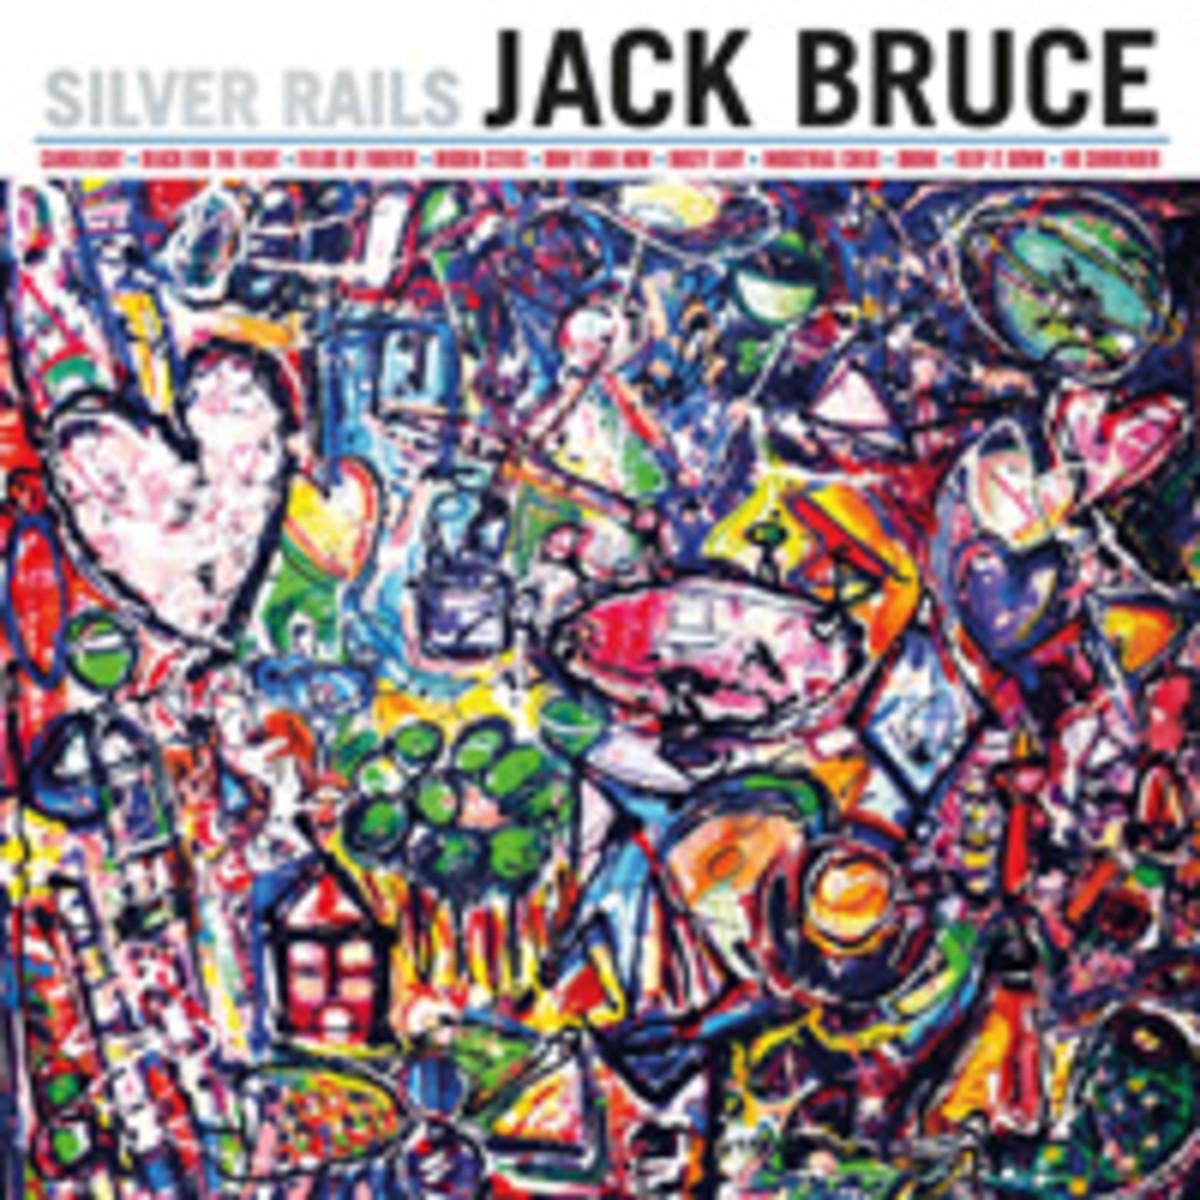 Jack Bruce Silver Rails